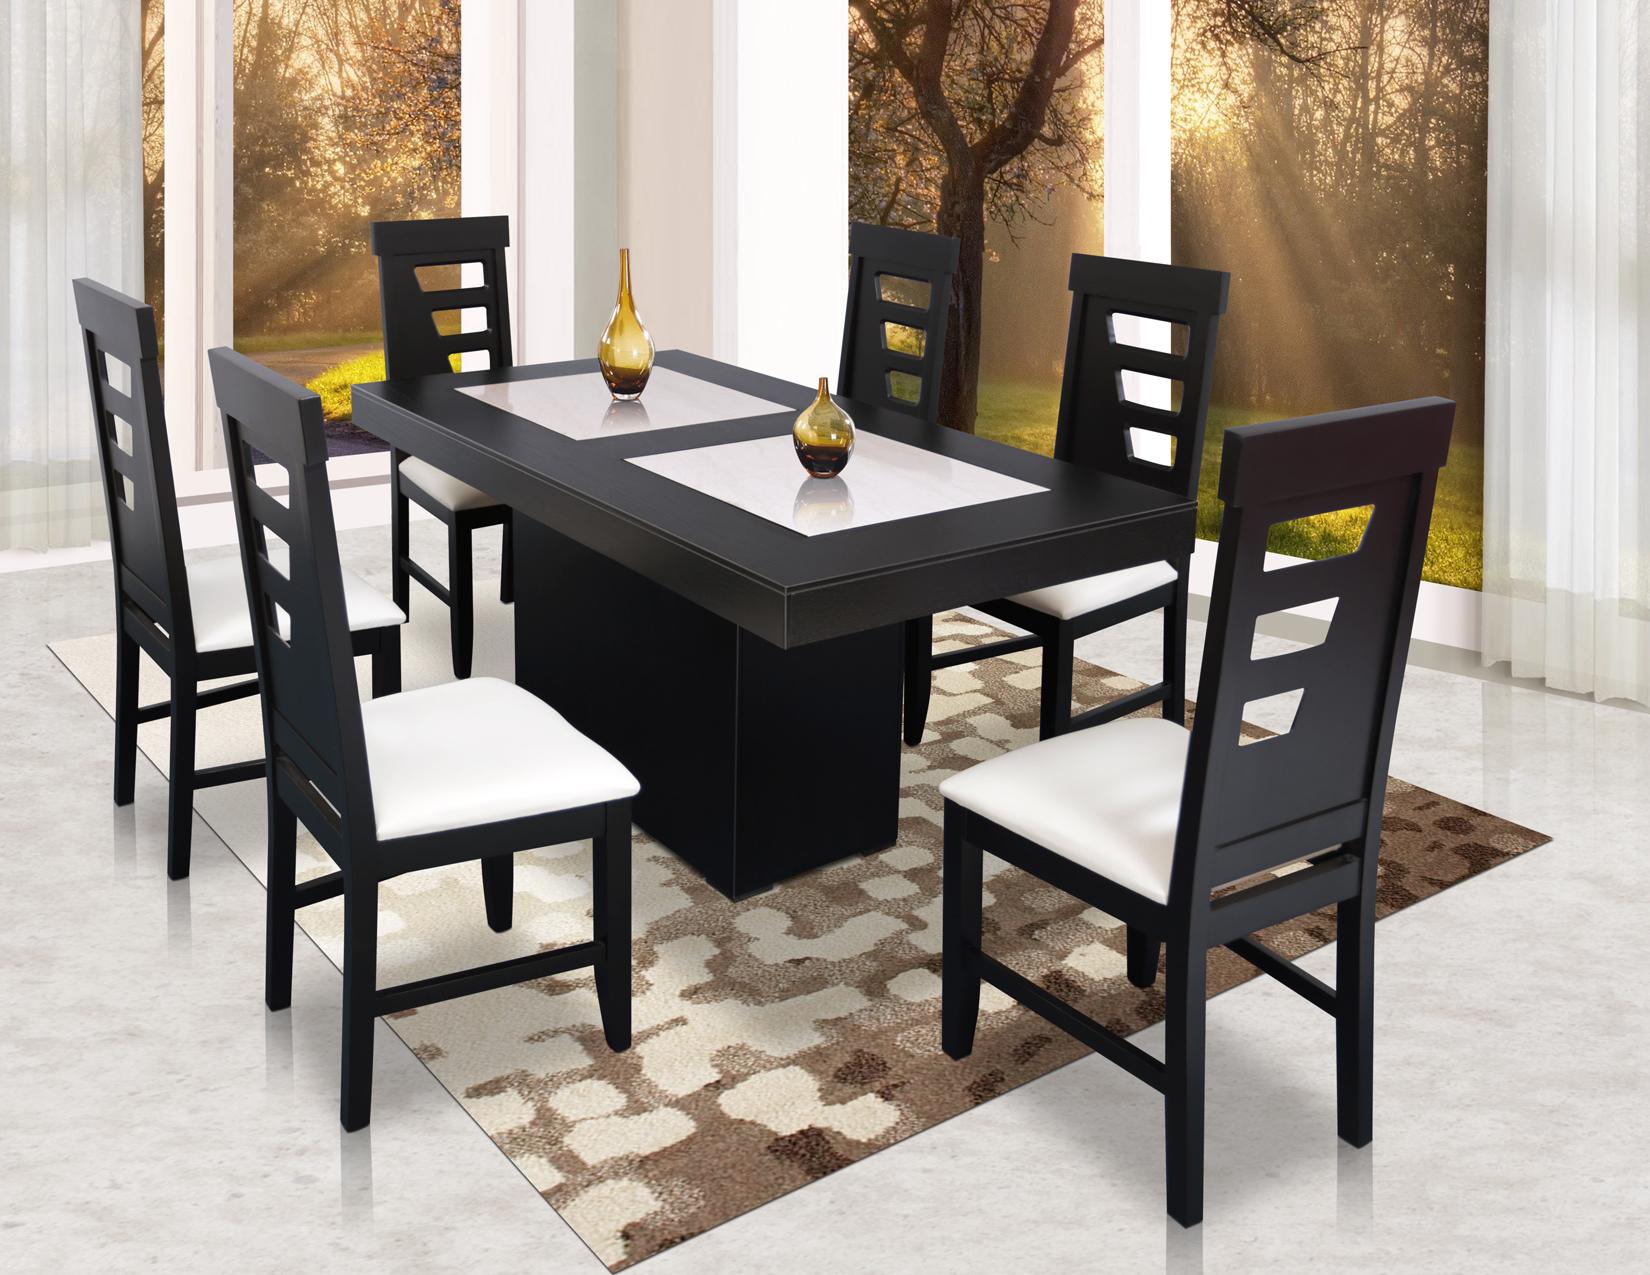 Paquete andre recamara k s comedor 6 sillas y centro de for Comedor pequea o 4 sillas